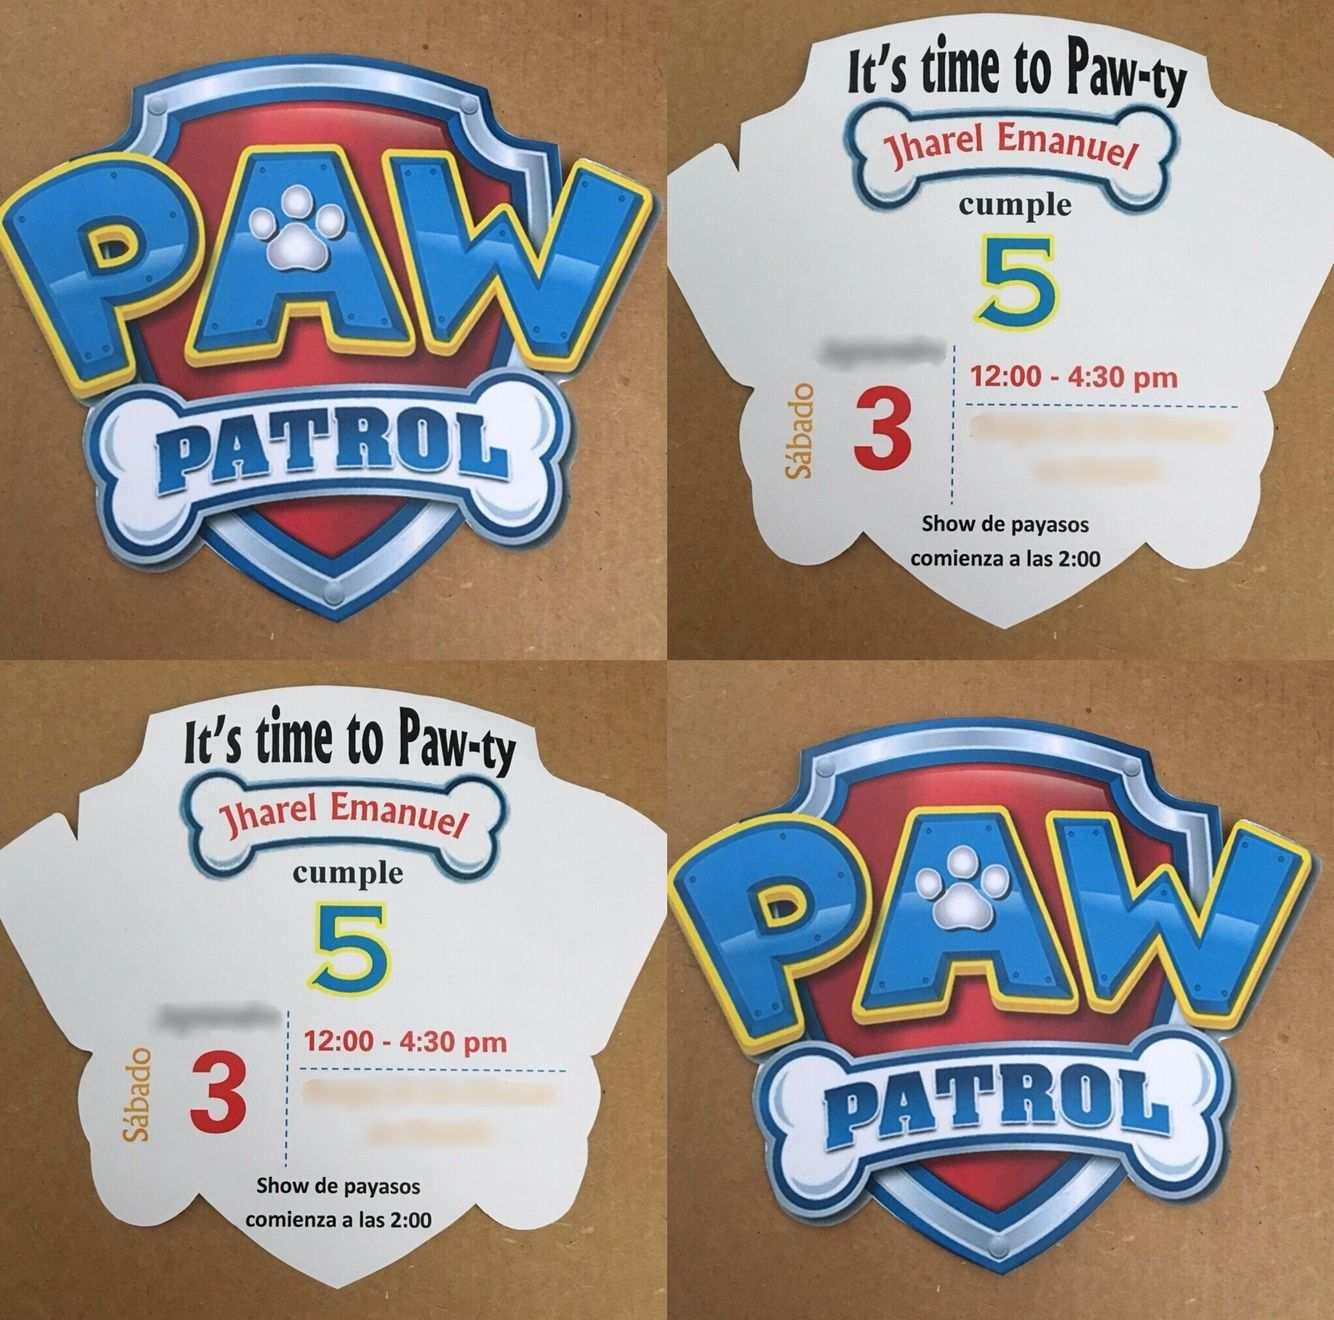 Paw Patrol Logo Invitations Paw Patrol Geburtstag Einladungen Pfote Patrouille Geburtstag Paw Patrol Geburtstag